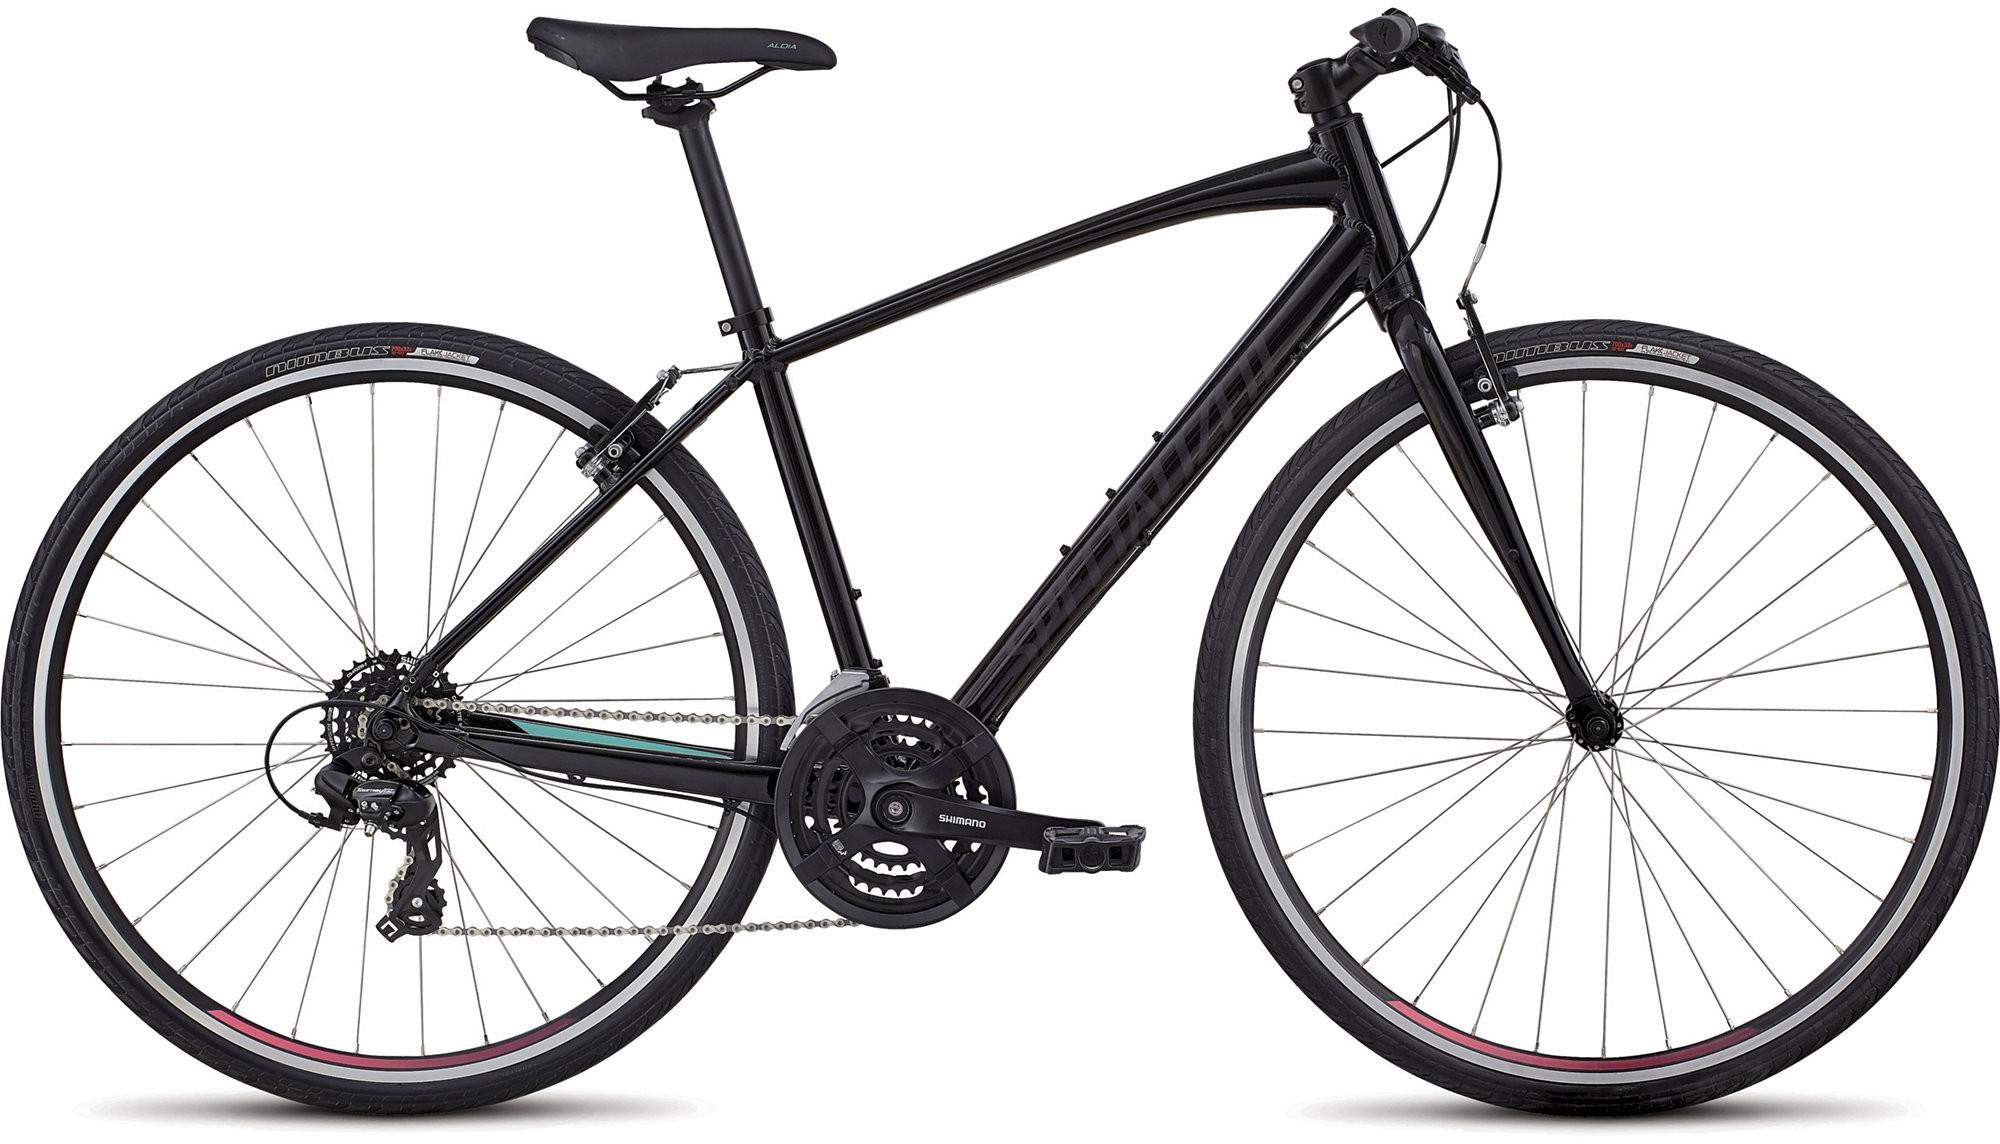 Specialized Sirrus Womens Hybrid Bike 2020 Black/Mint £382.50 @ Leisure Lakes Bikes